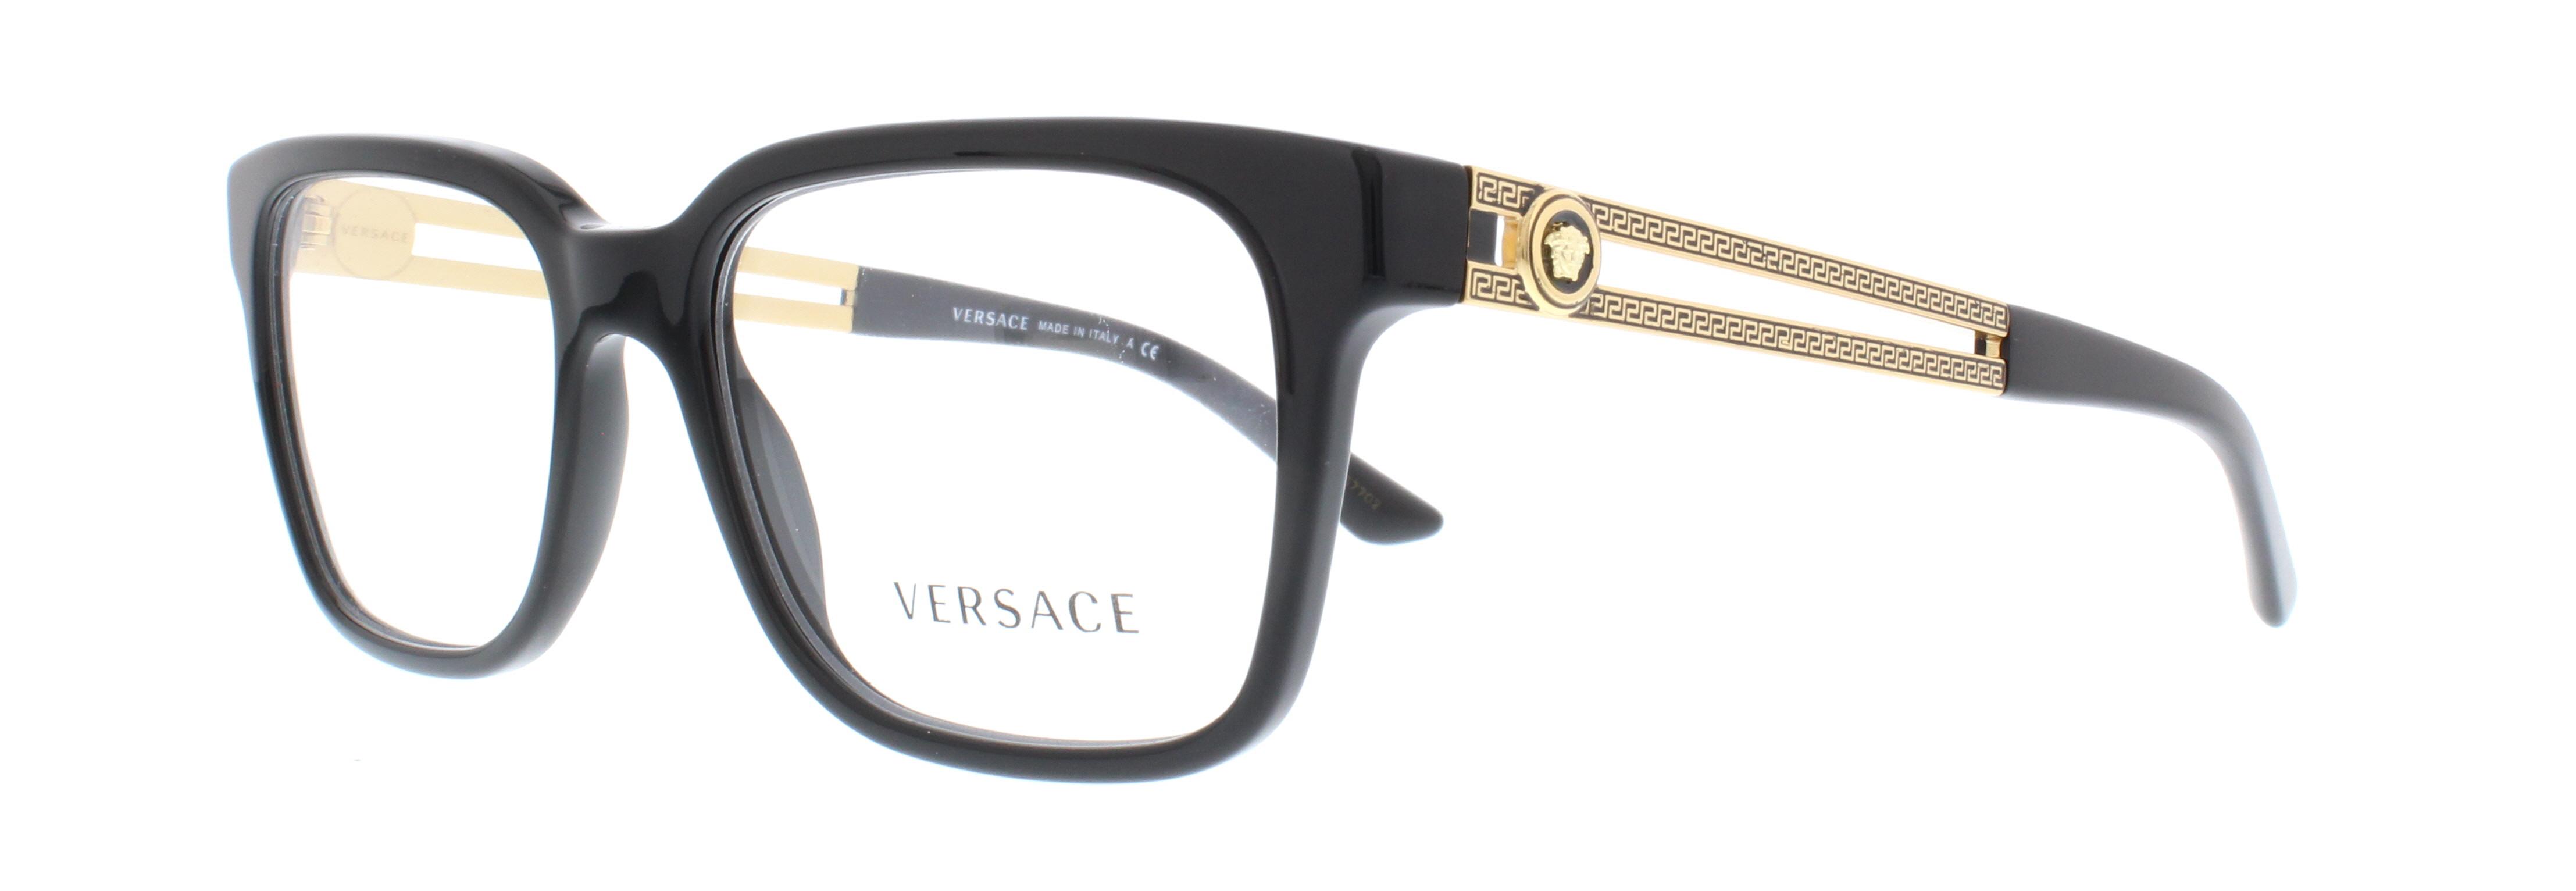 545d84c176 Similiar Versace Sunglasses Gold Frame Keywords